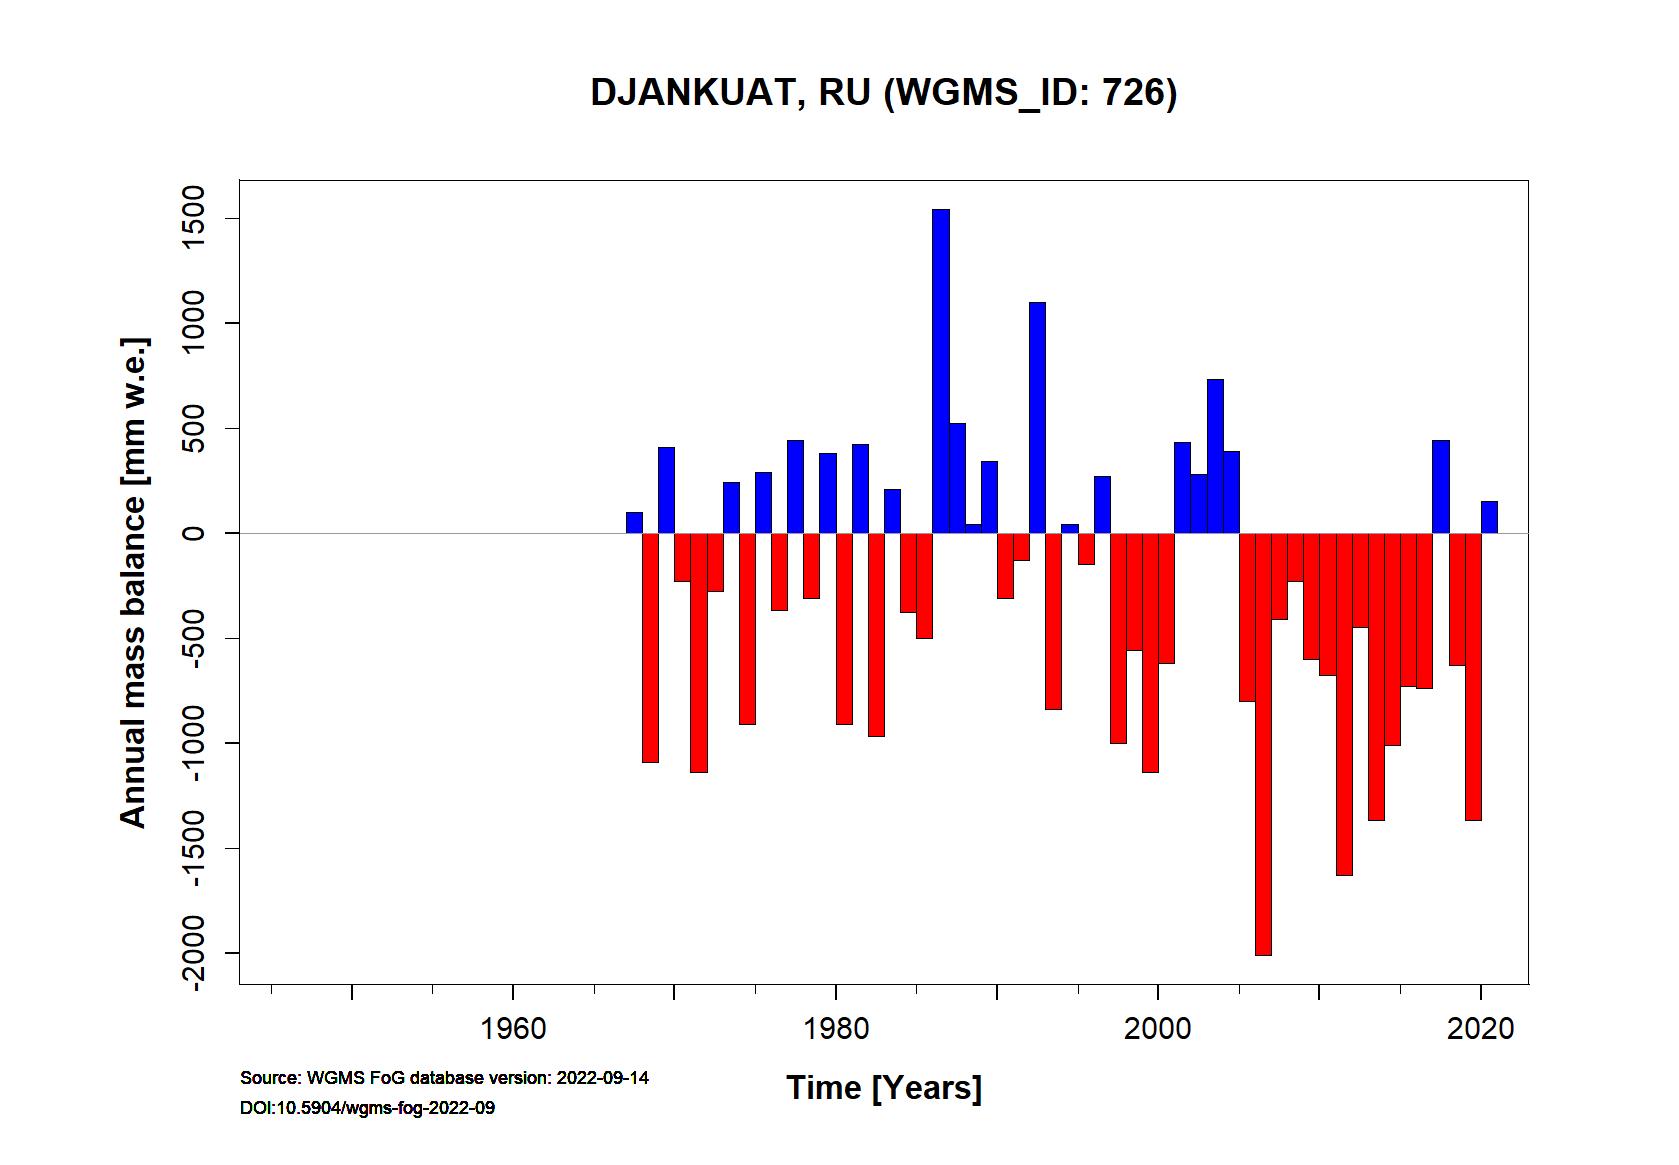 Djankuat glacier Annual Mass Balance (WGMS, 2015)